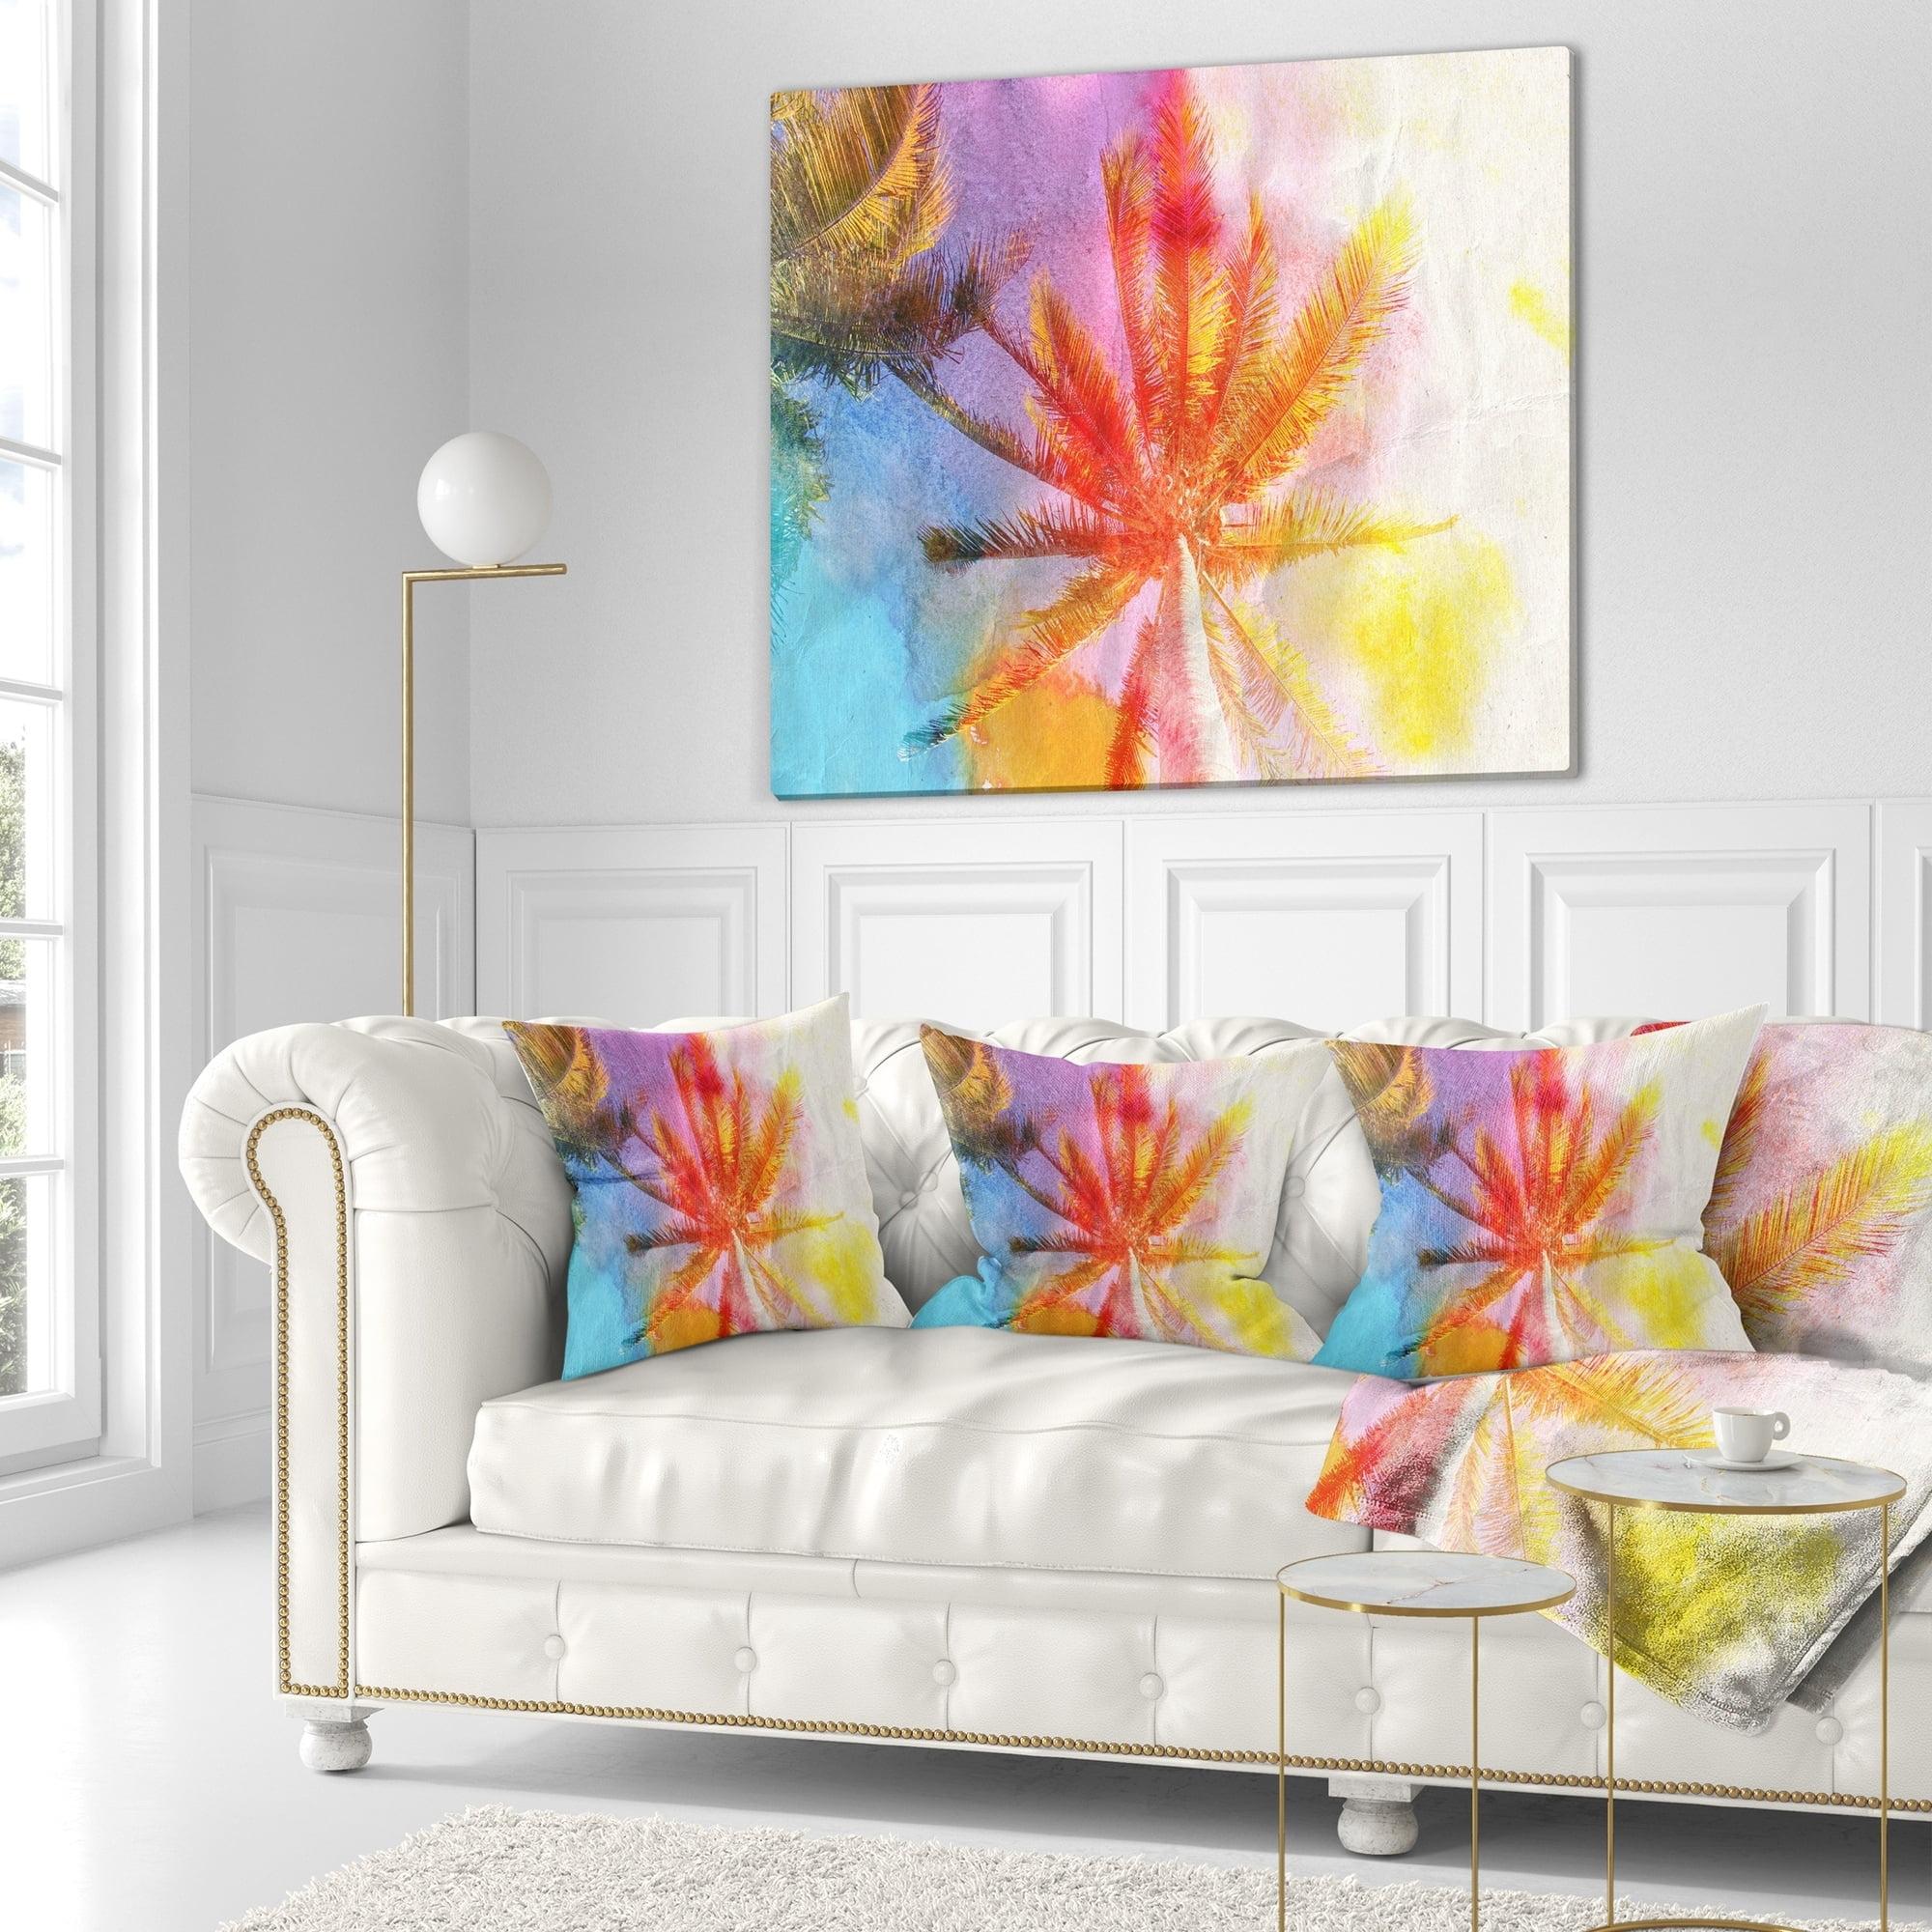 Design Art Designart Reflective Retro Palm Trees Landscape Painting Throw Pillow Walmart Com Walmart Com